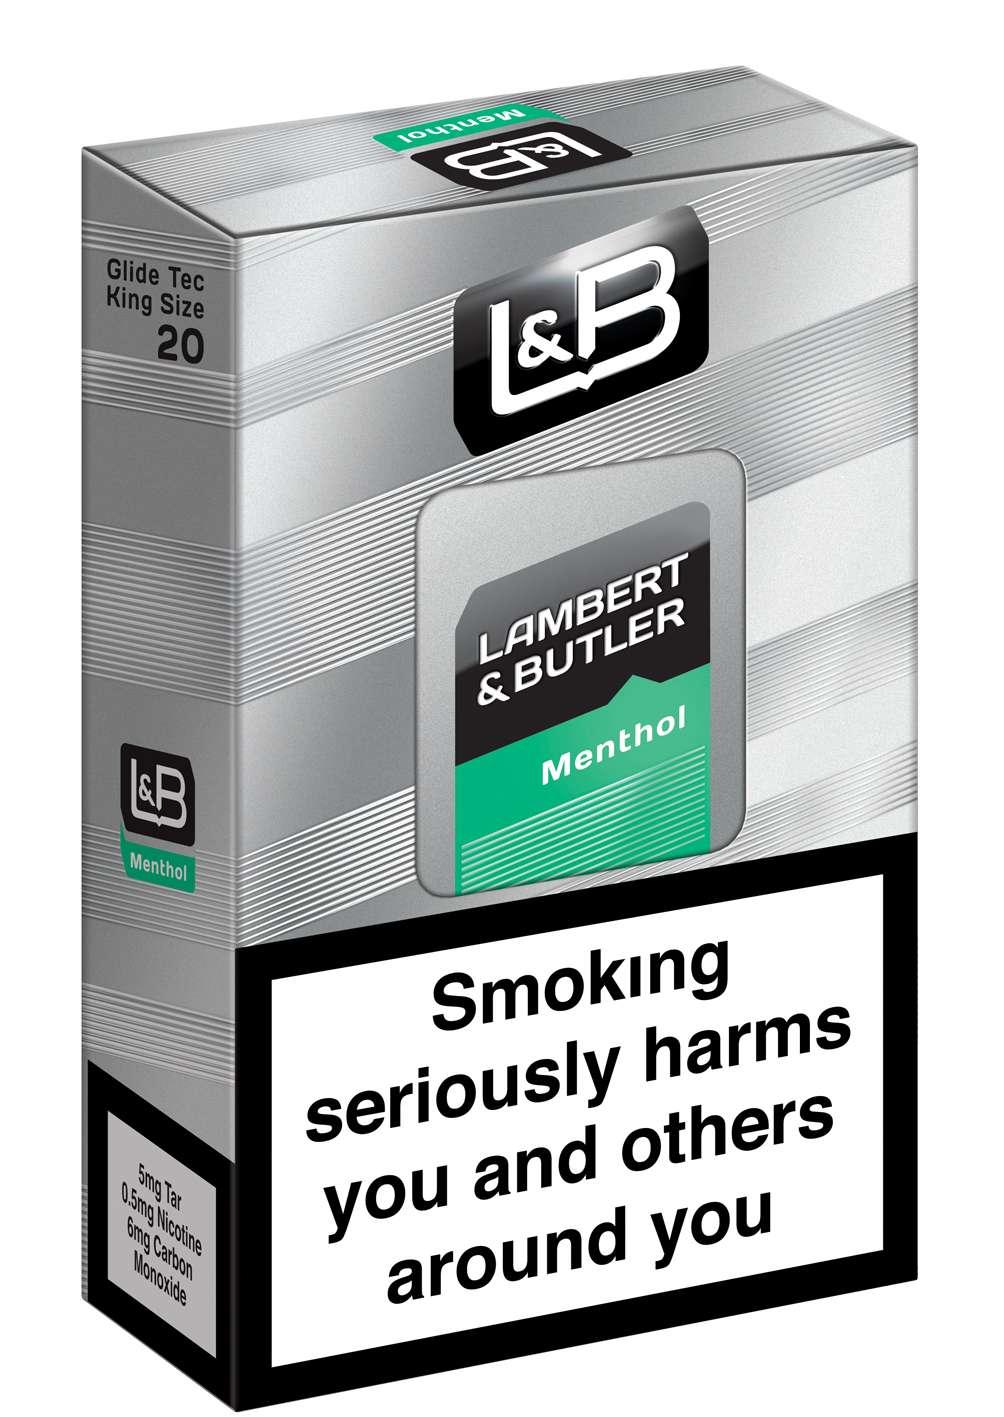 Next cigarettes Alaska prices